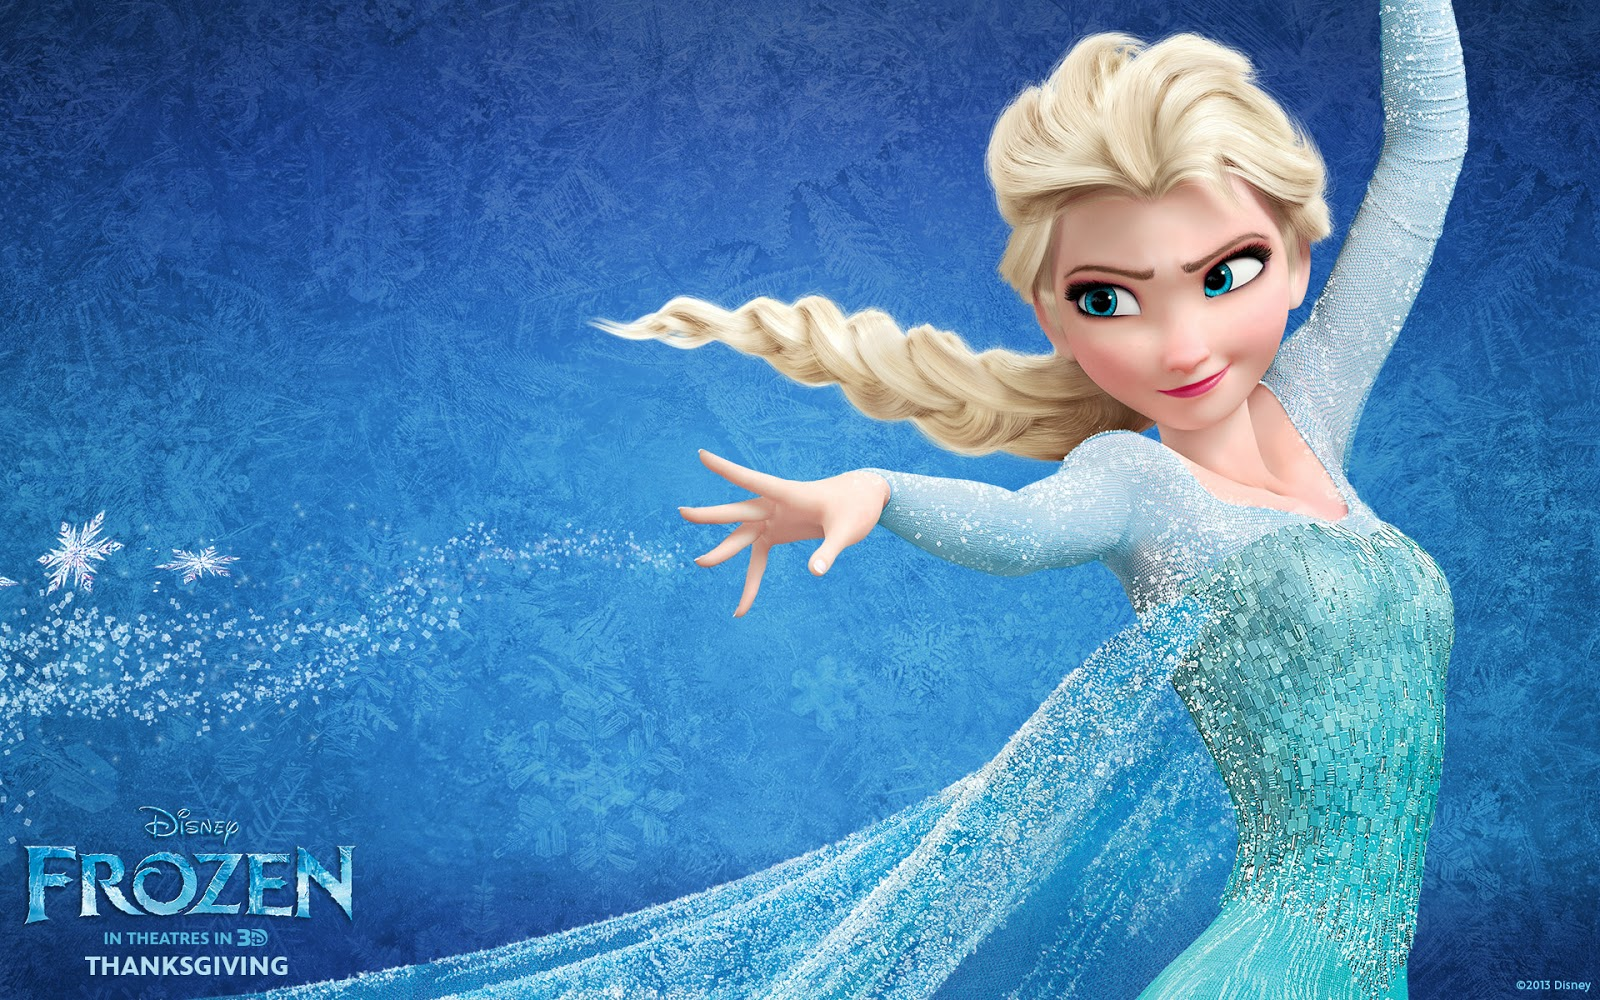 Kisah Elsa yang mampu menciptakan es ini ternyata sangat digandrungi